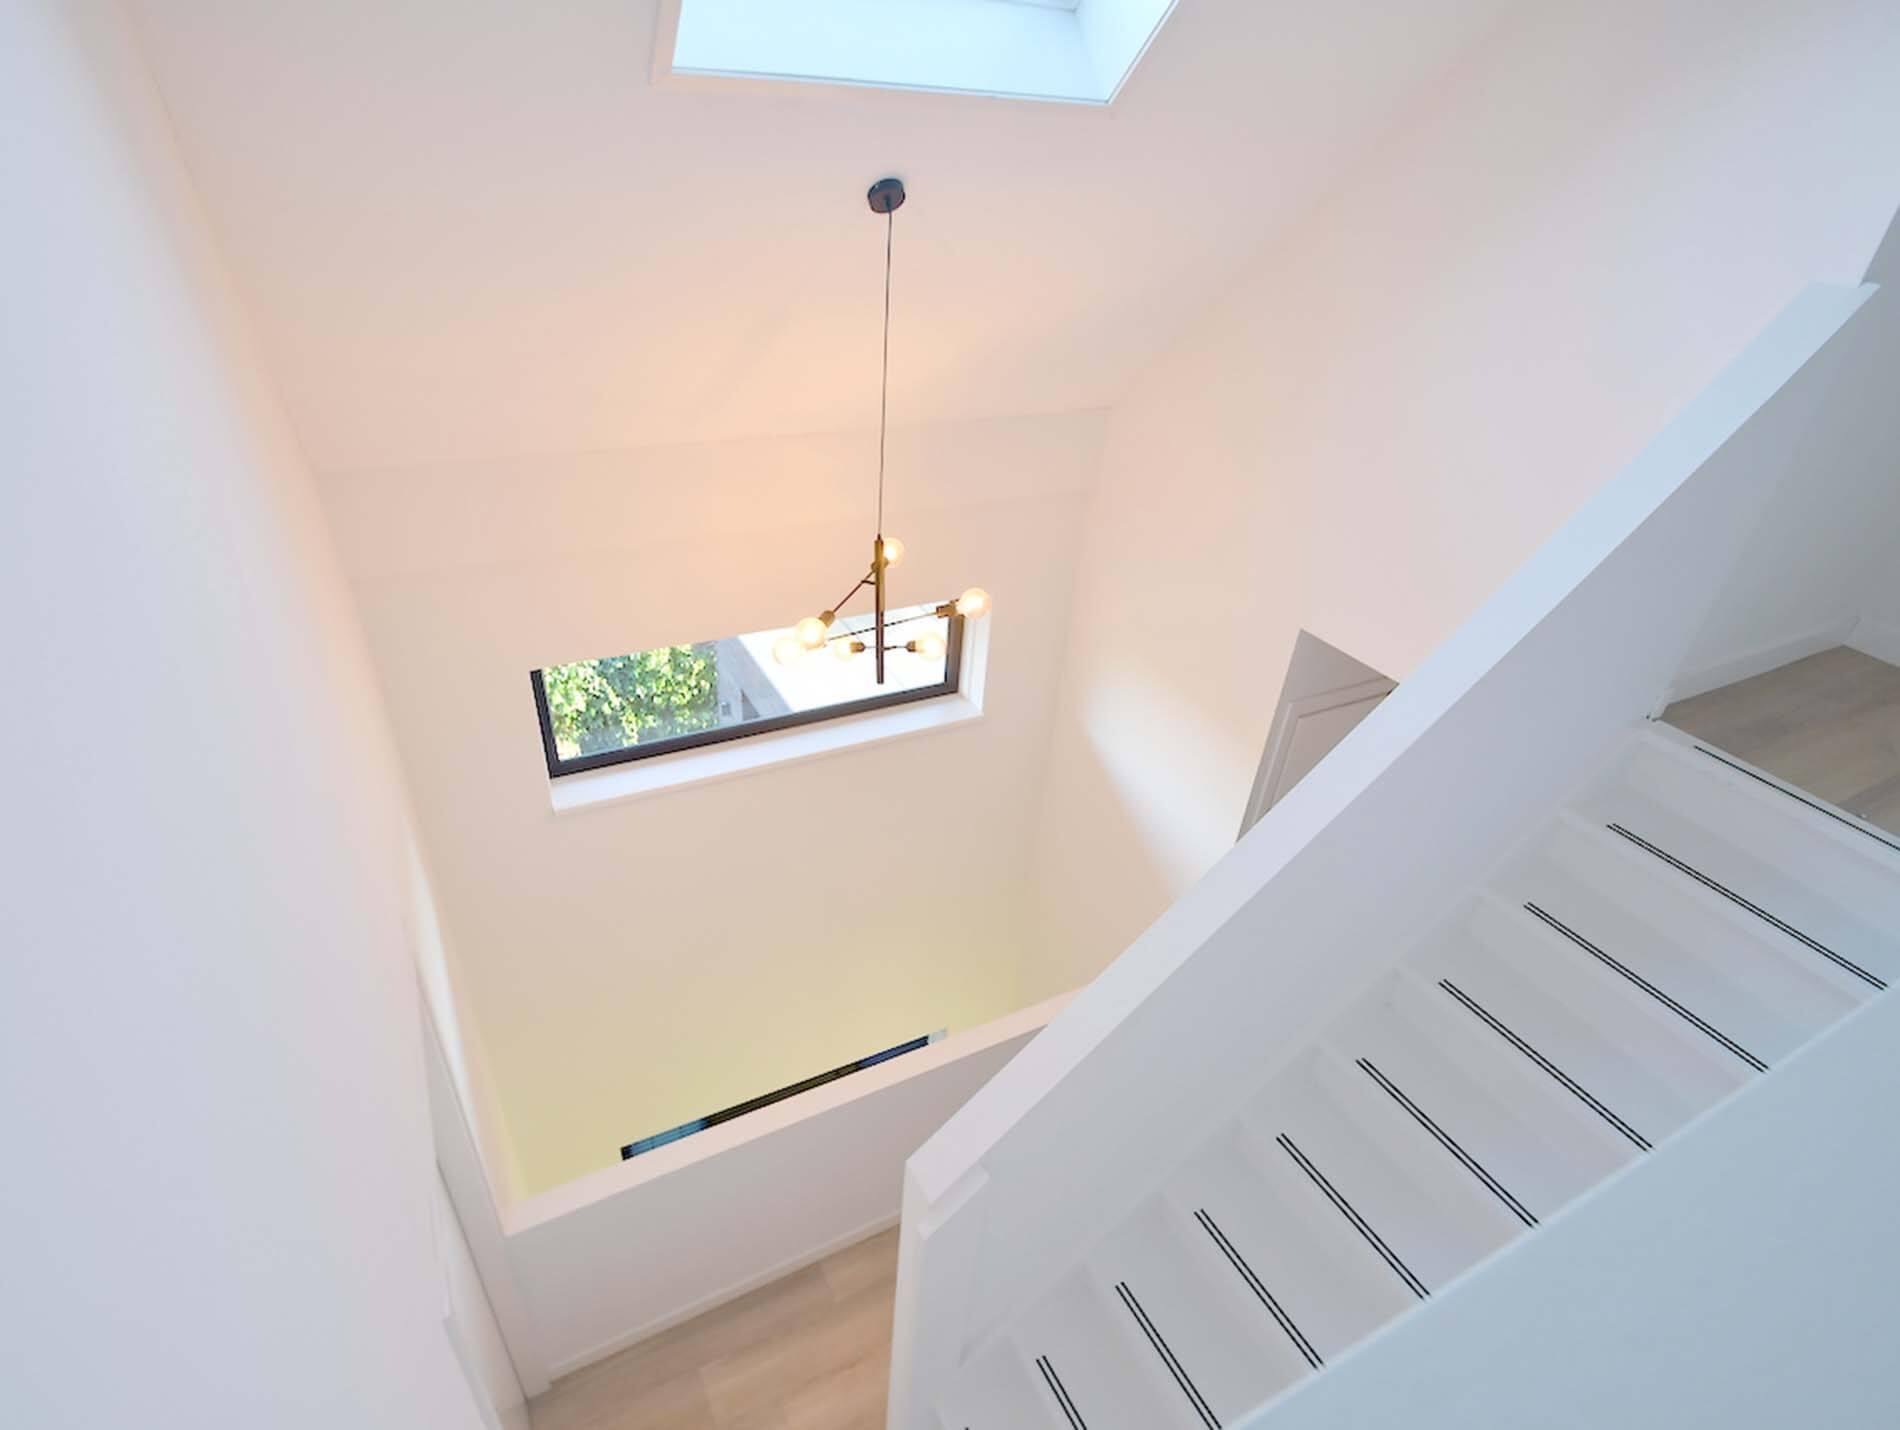 9.Interieur-drachten-nieuwbouw-woning-1900x1430p.jpg